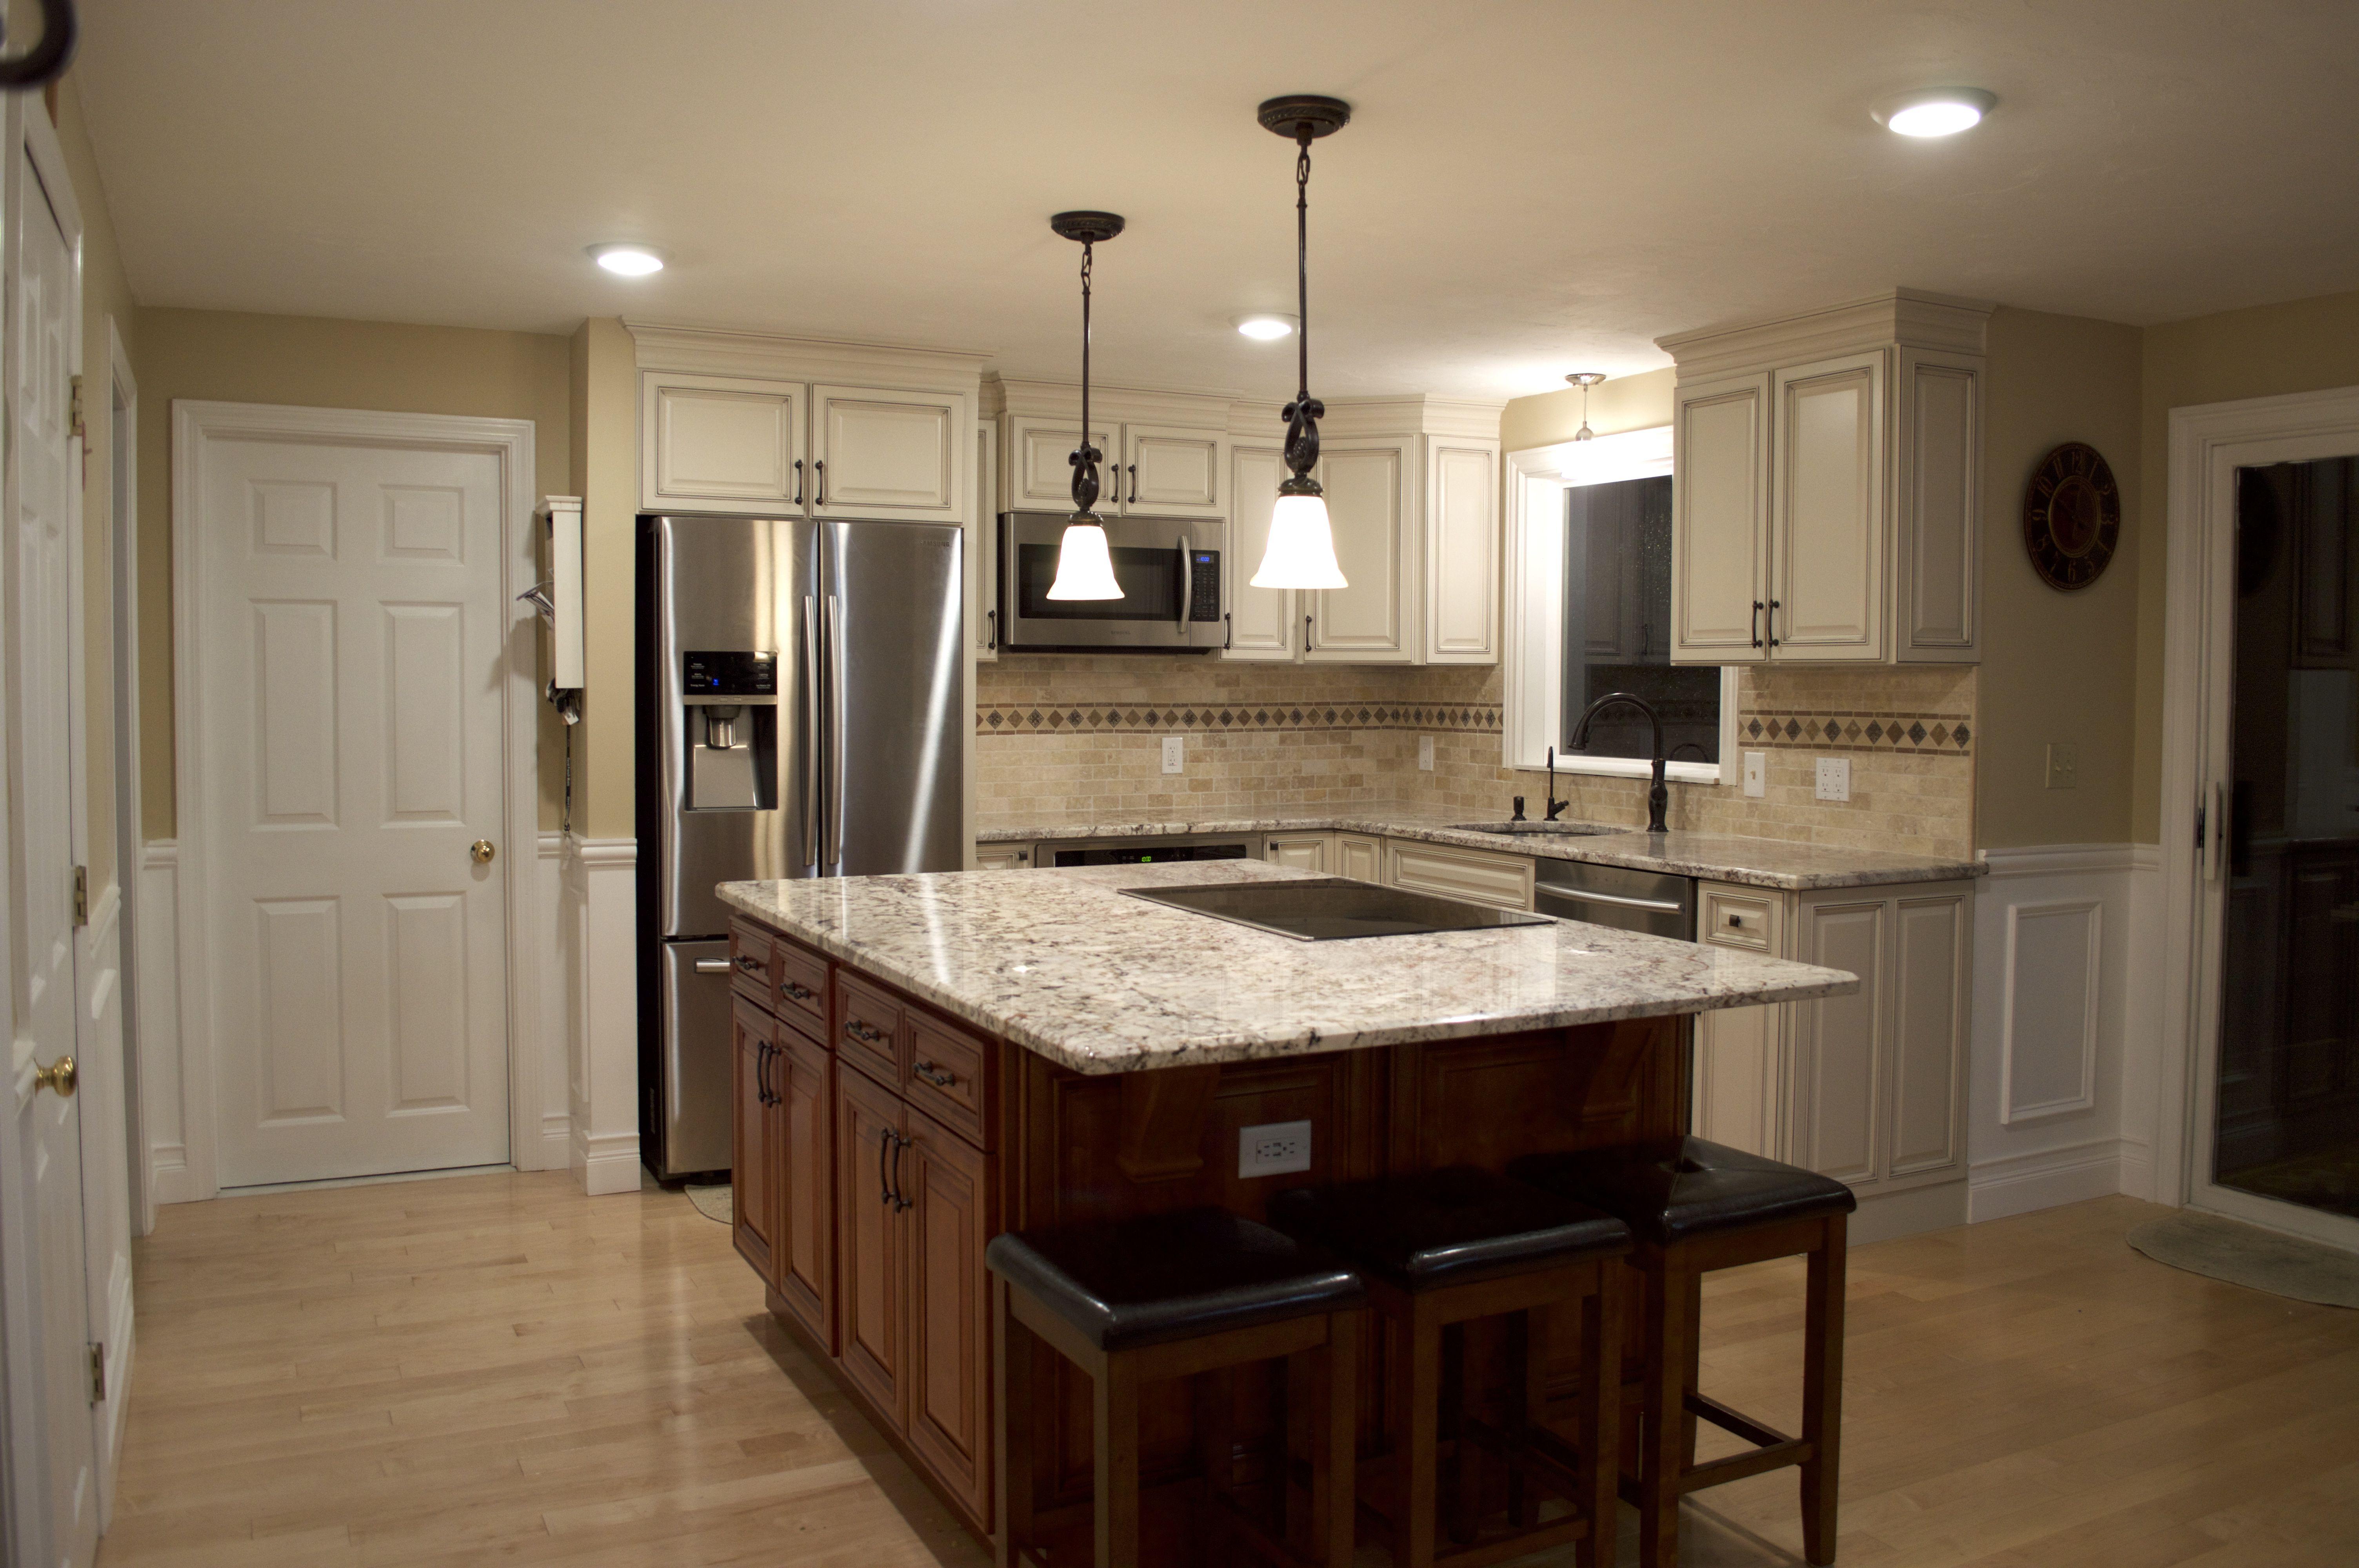 WINNER! Kitchen renovation by Joe and Mirelle L. of ...